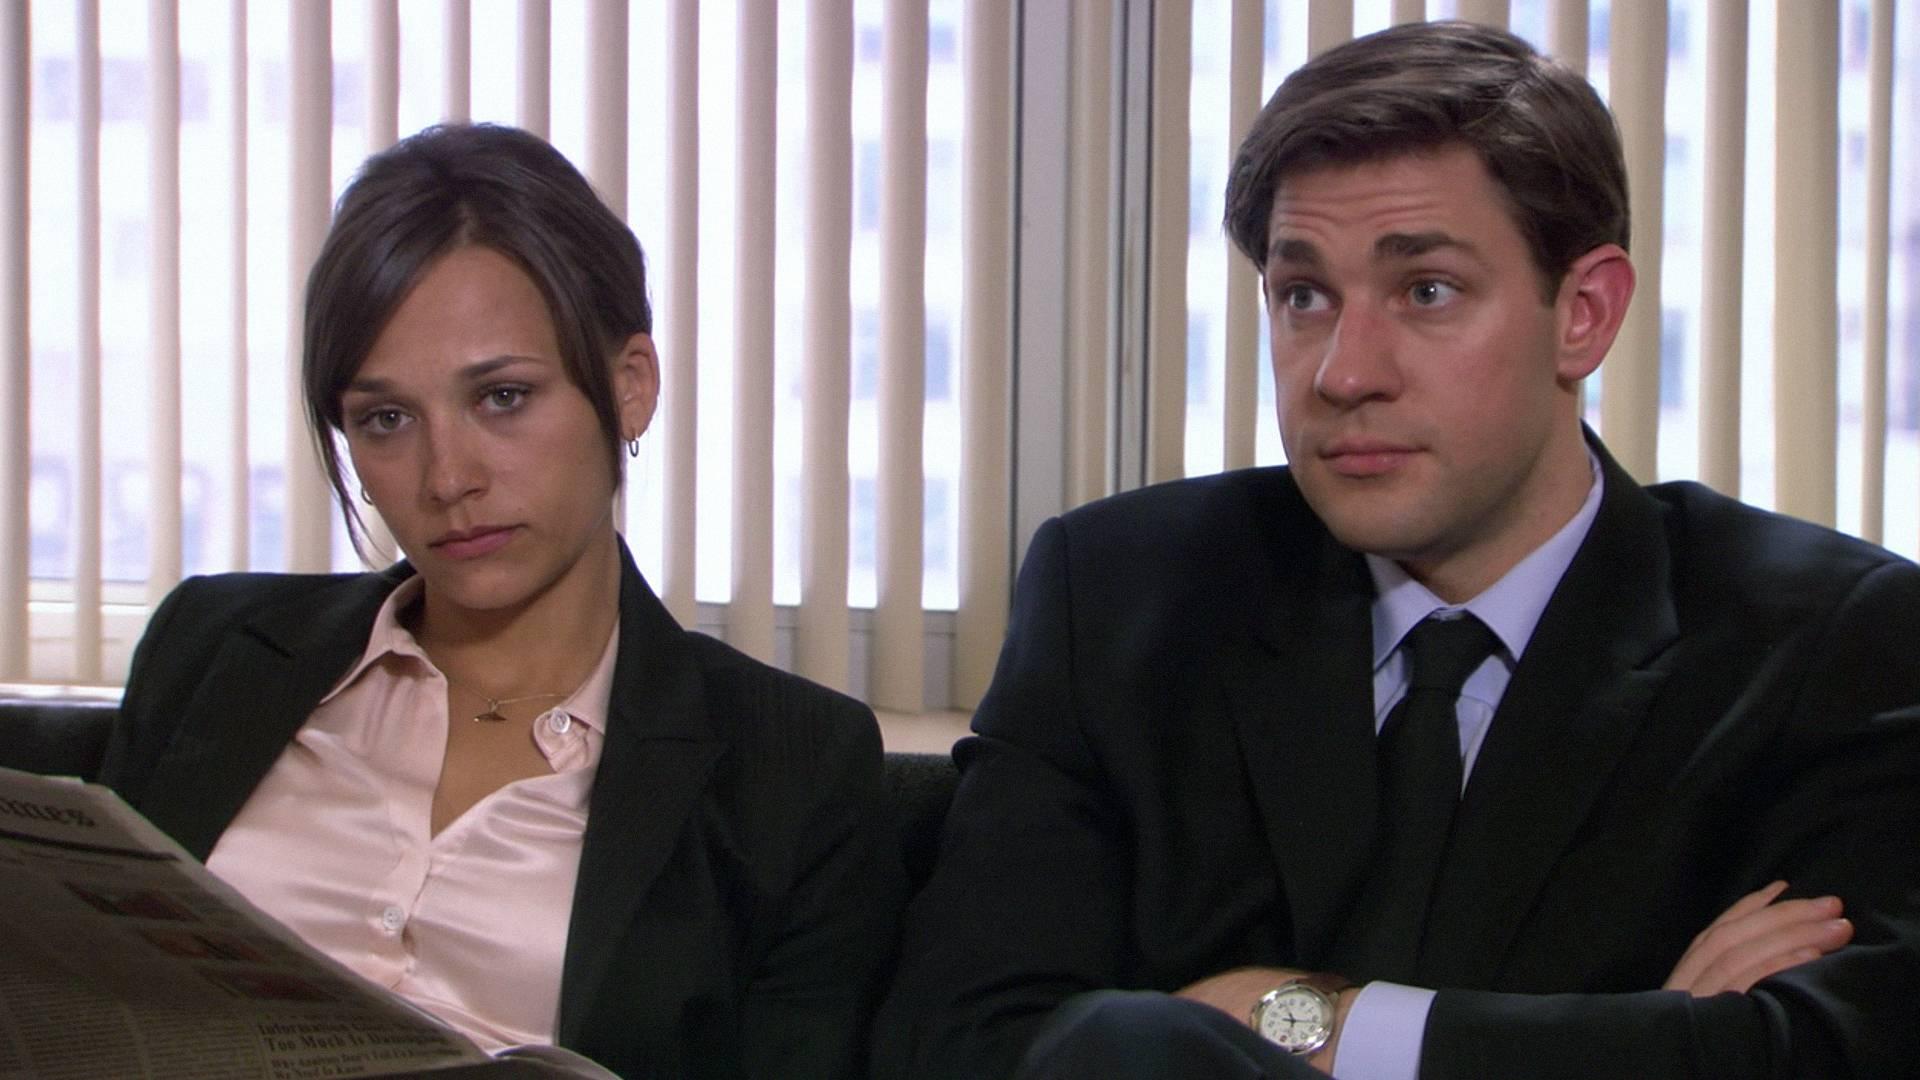 The Office Season 3 Episode 25